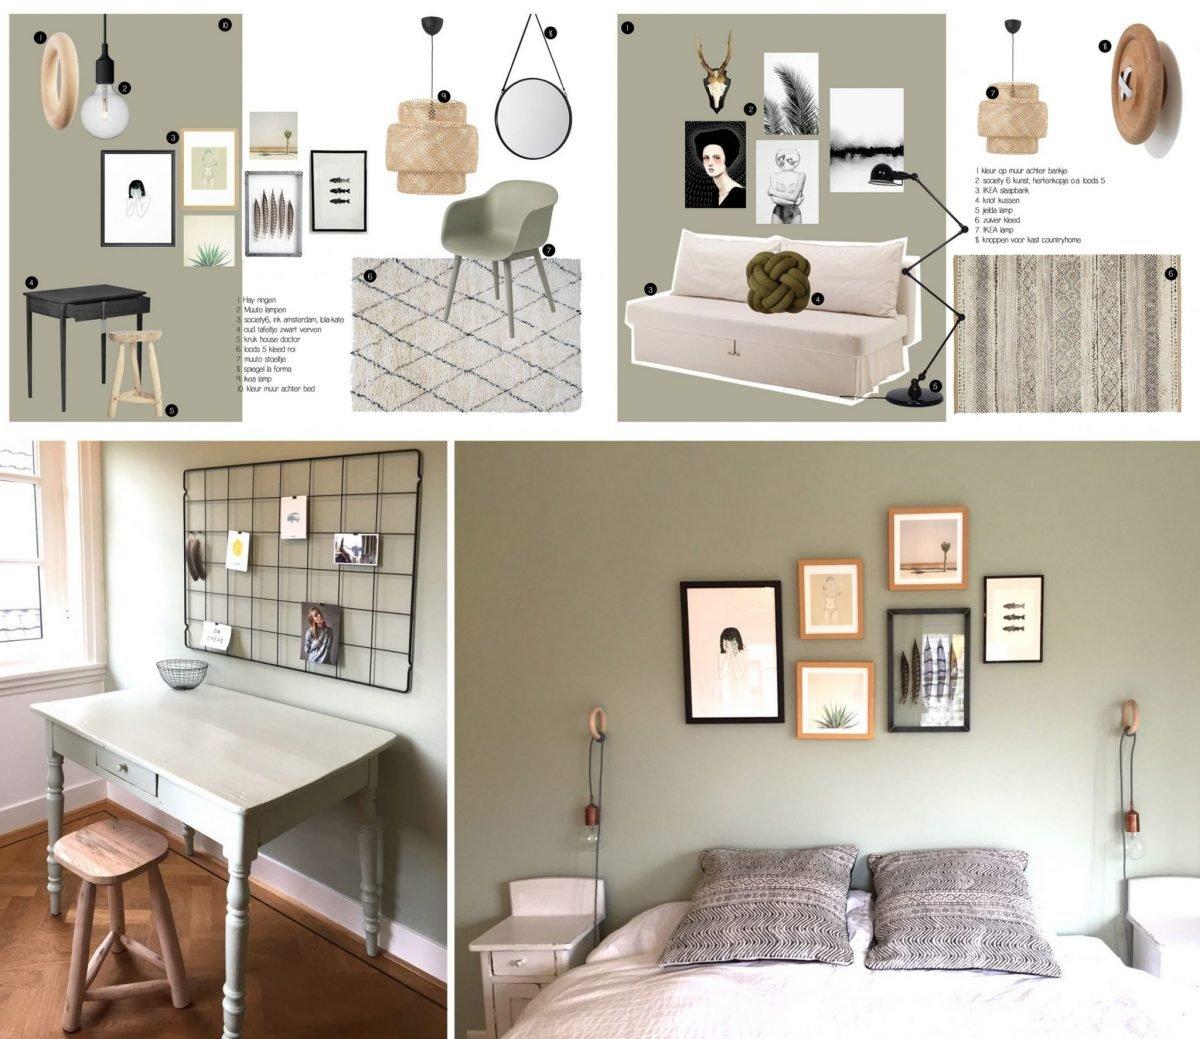 Interieur advies slaapkamer kinderkamervintage for Advies interieur